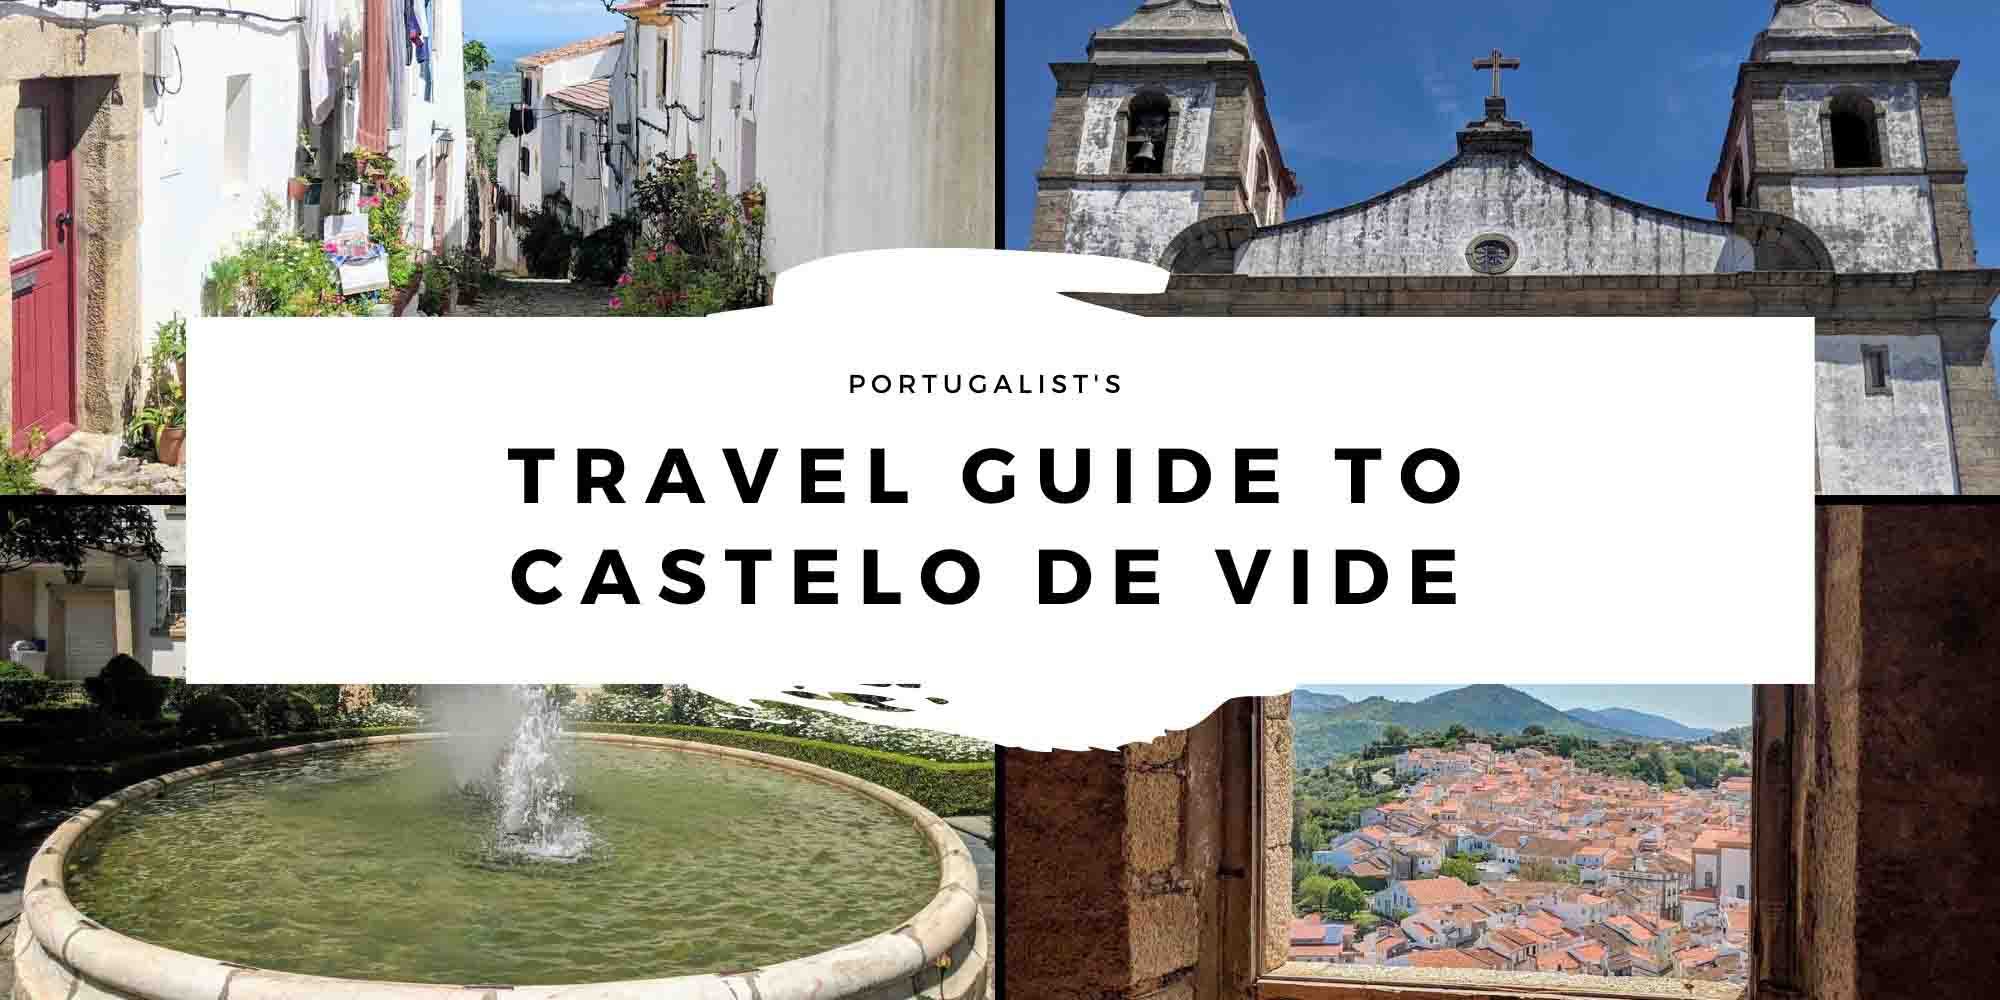 Castelo de Vide Guide header